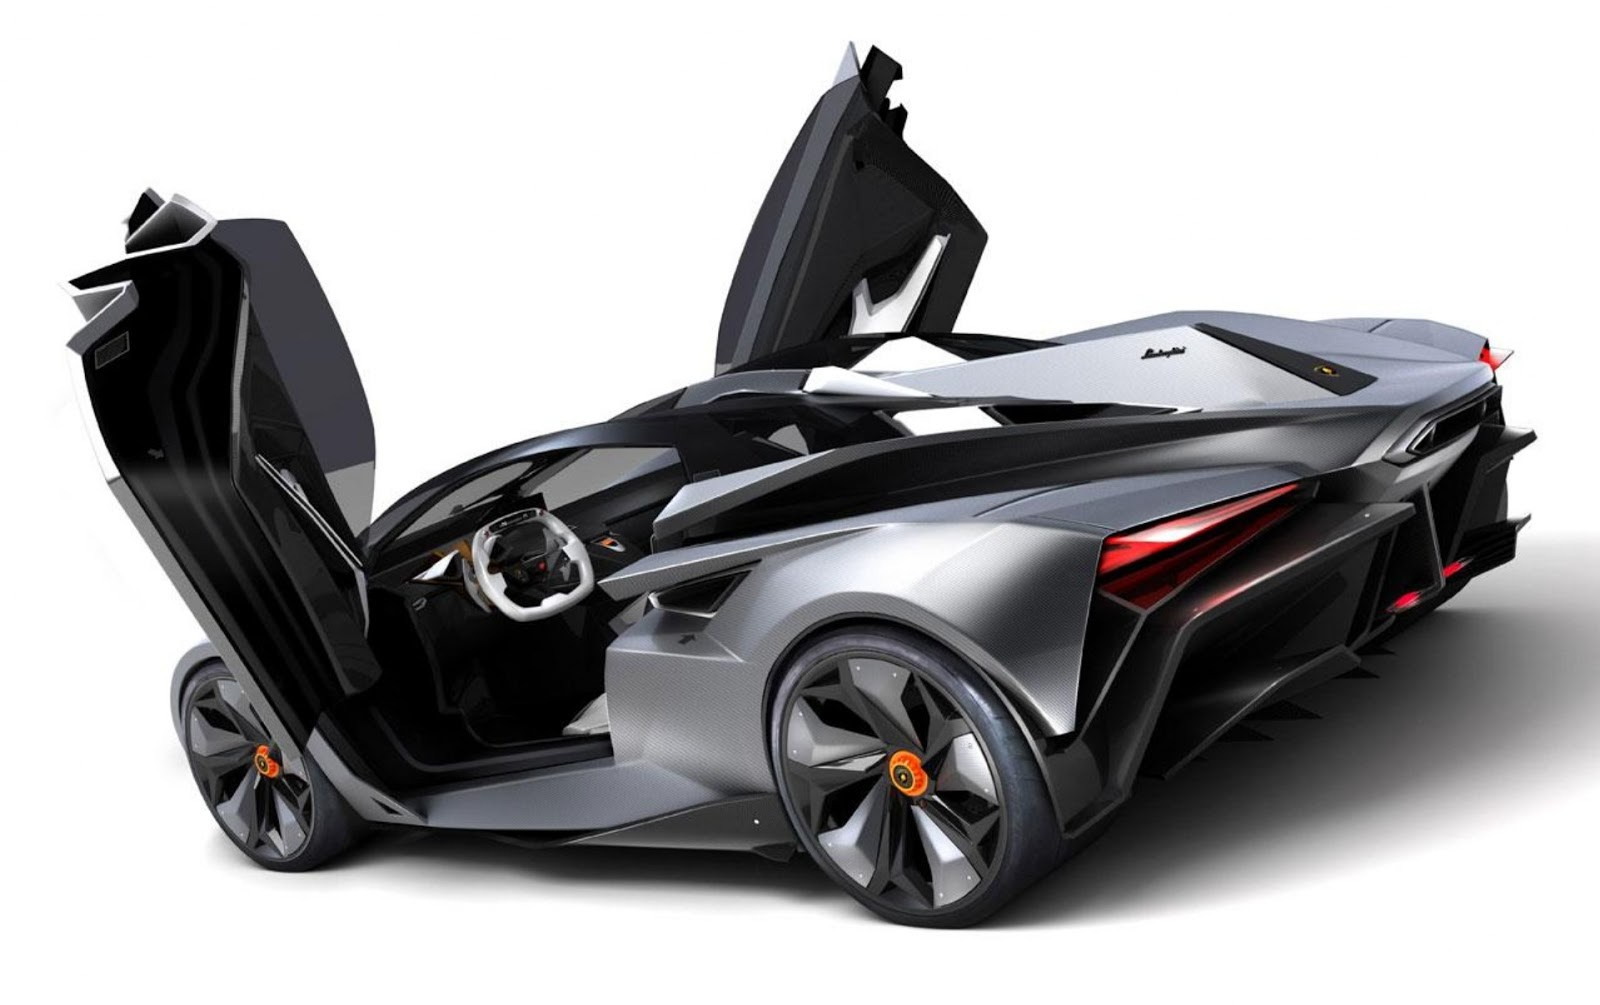 La future Lamborghini Cabrera en vidéo